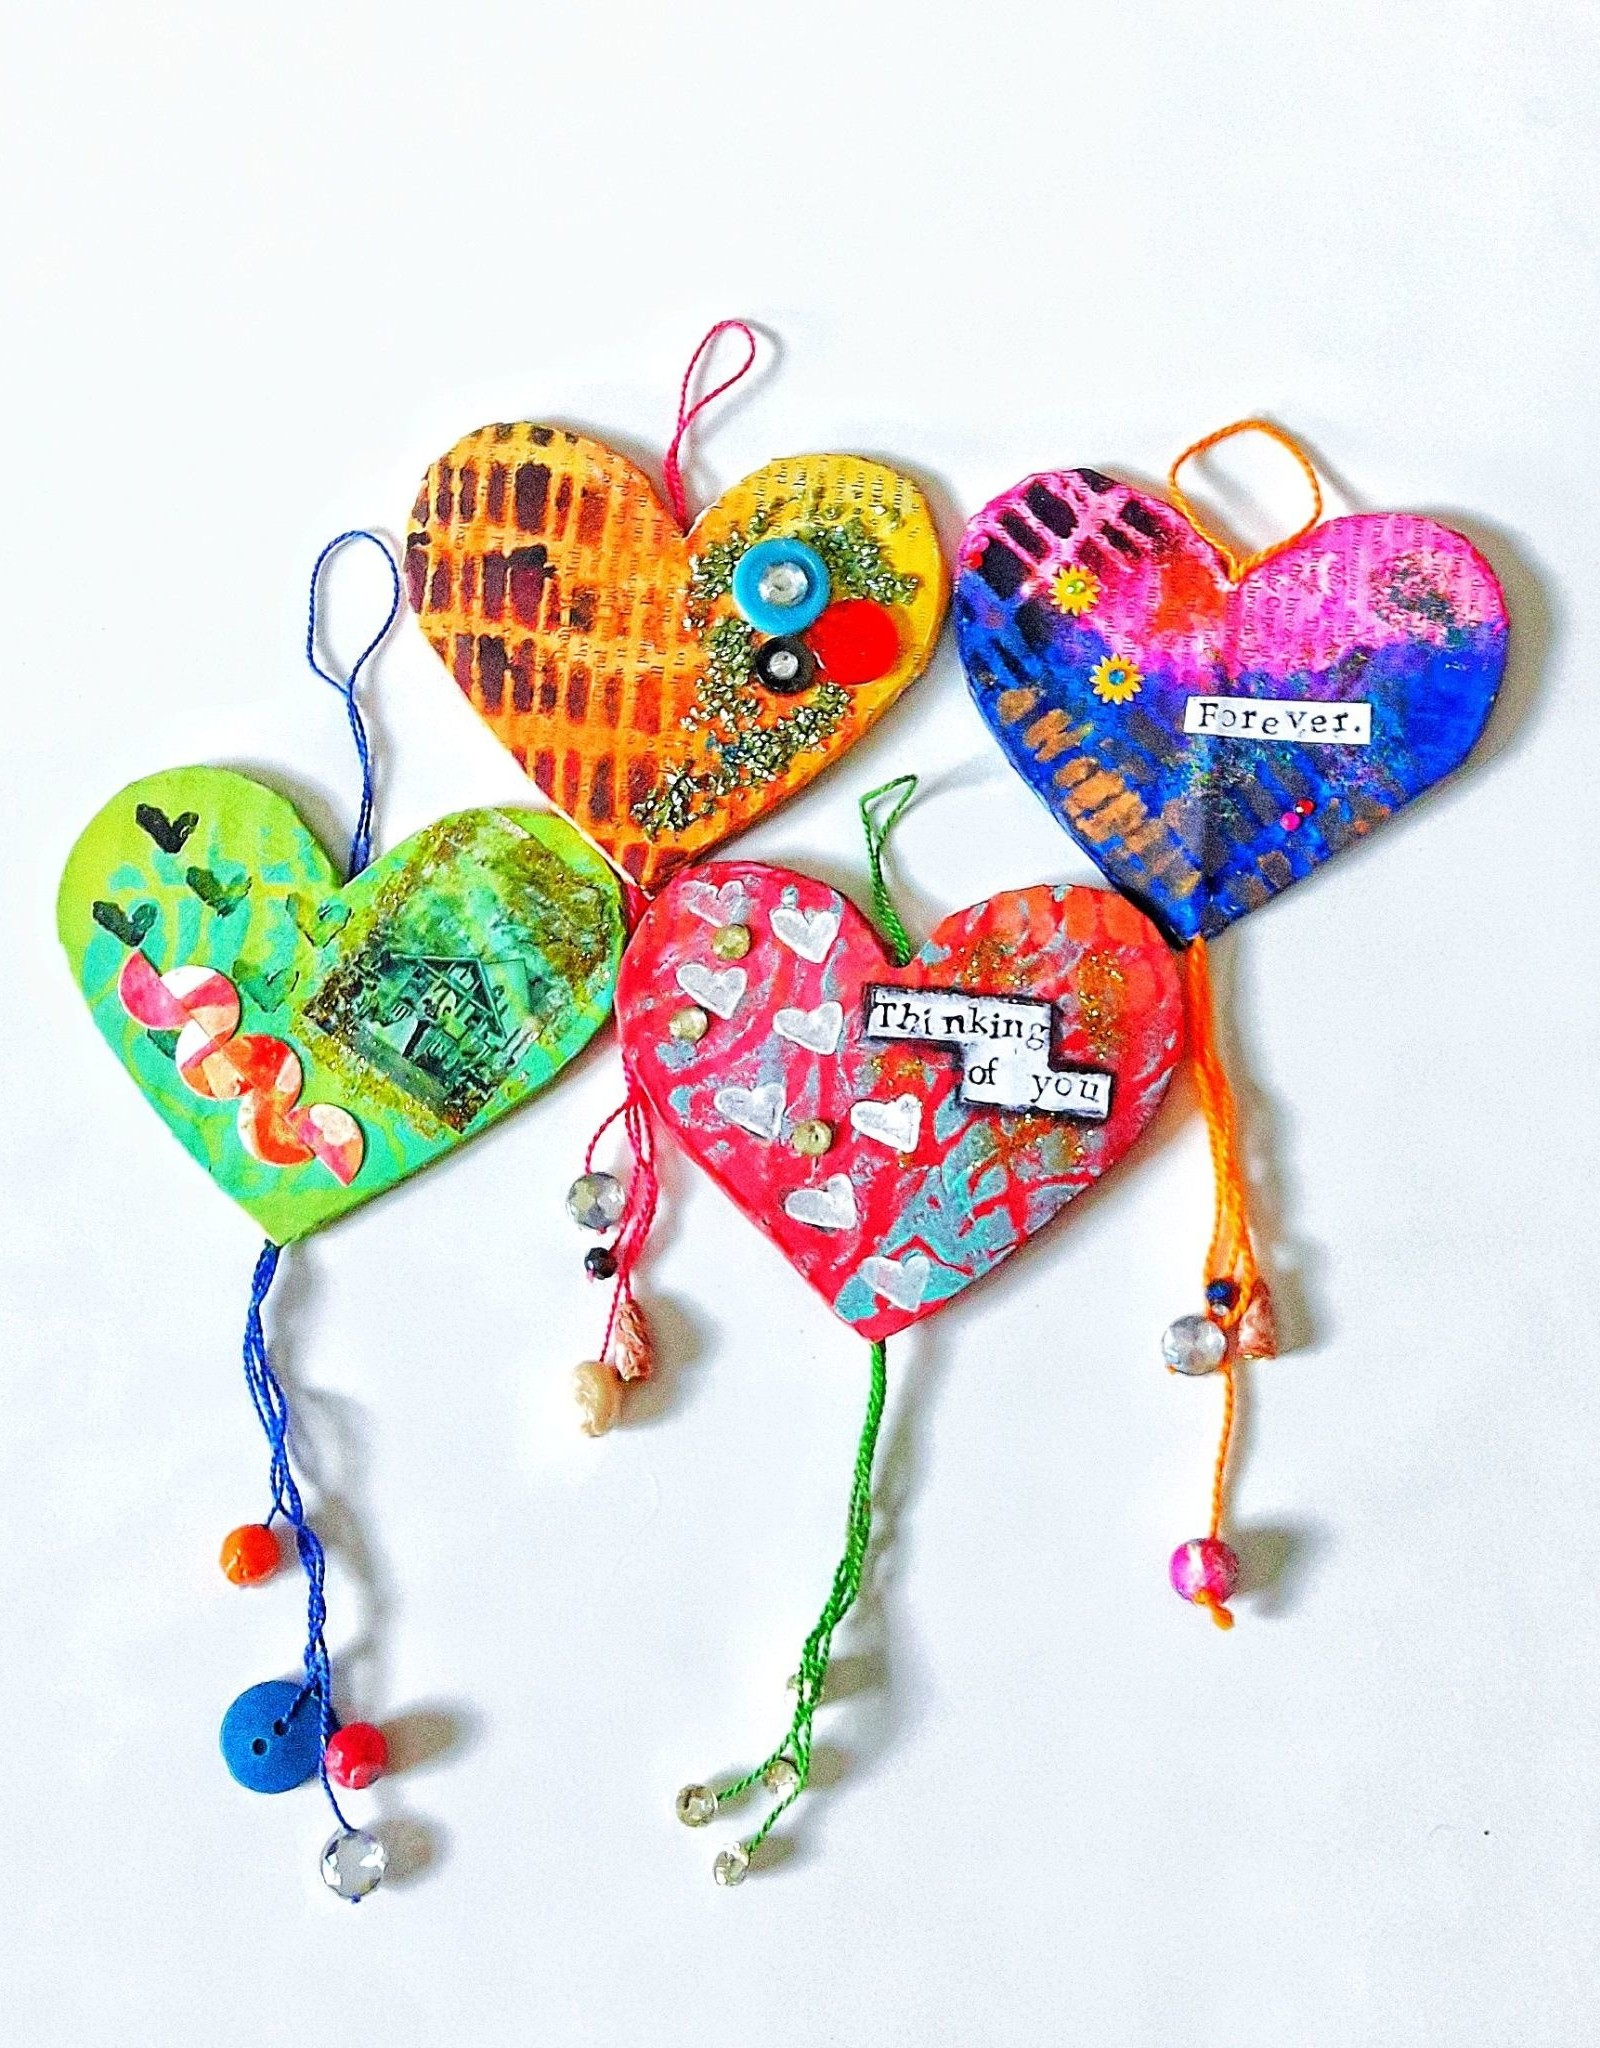 Amsa Mixed media art class  Paper Mache Colorful hearts  Feb 4 4:15-5:15pm